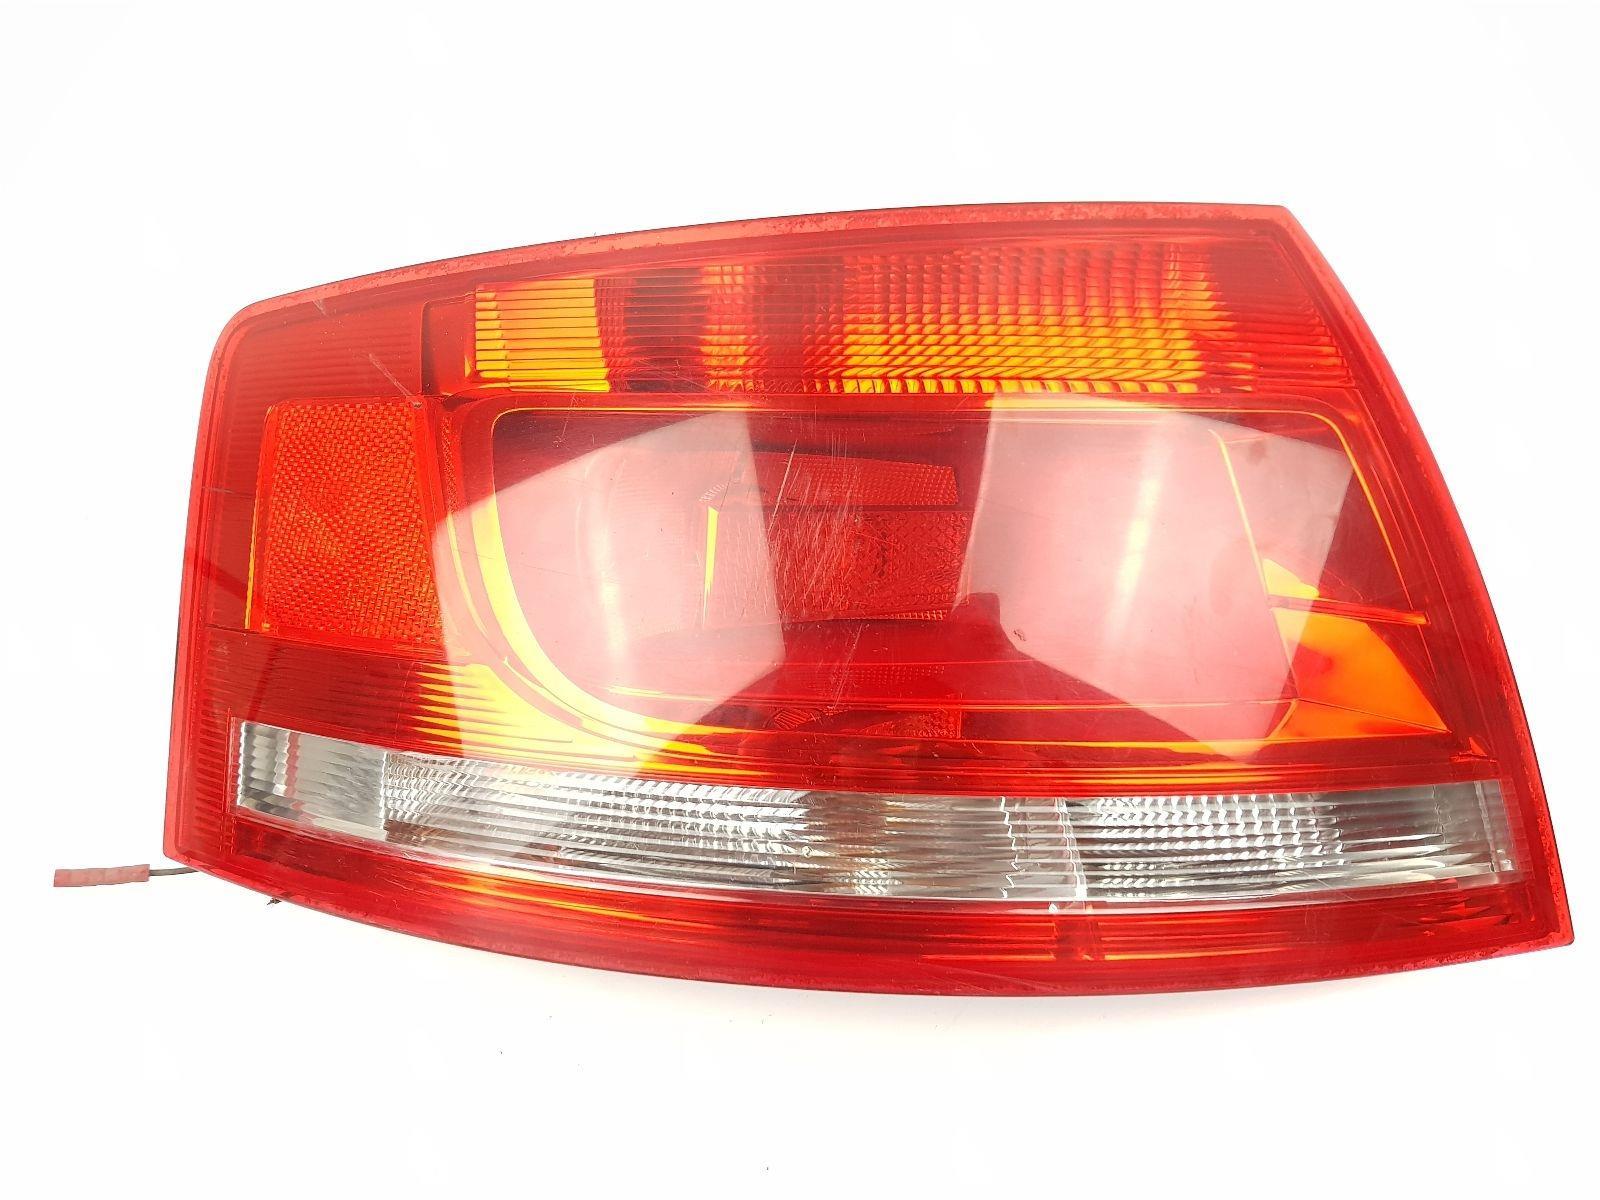 2003 Audi A4 2001 To 2005 Sport 1.8cc Manual Petrol BLACK 2 door Car Lamp